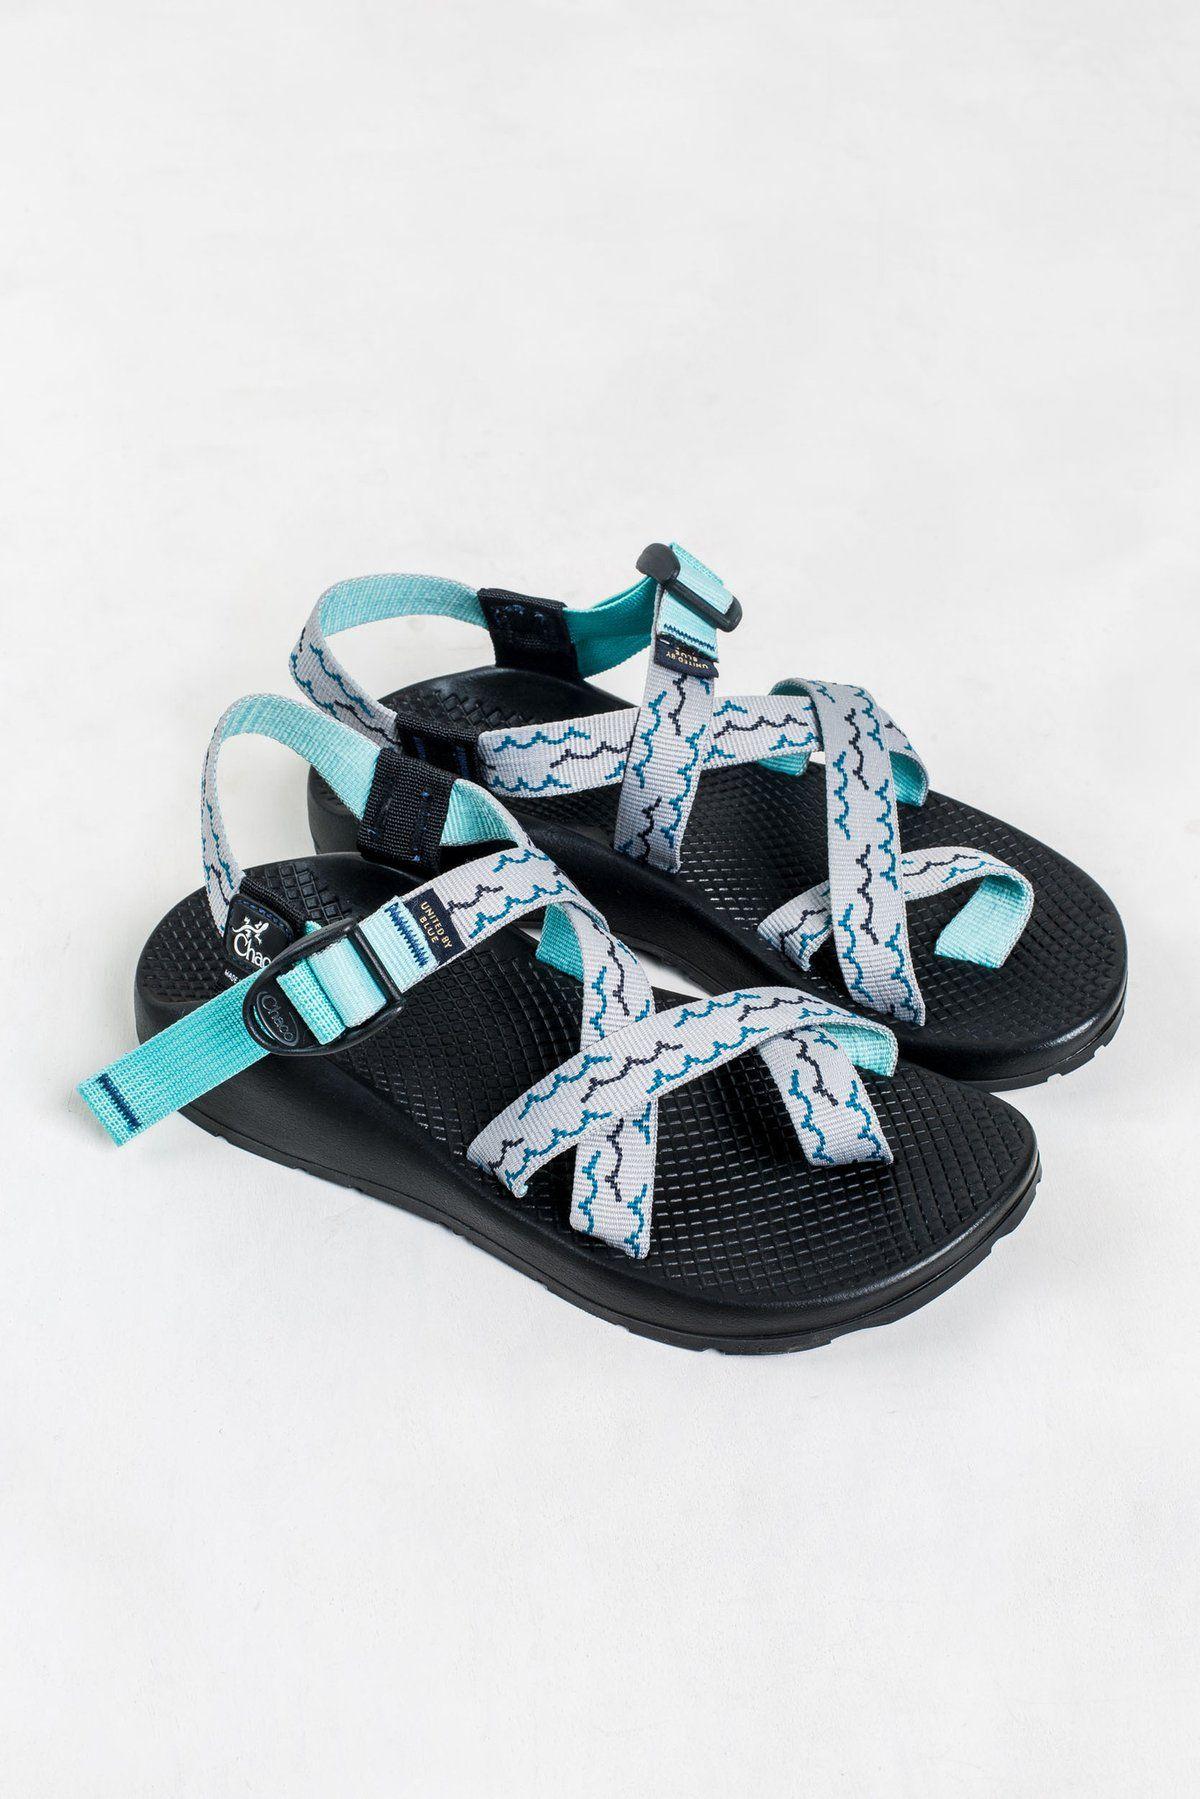 UBB x Chaco Women's Open Sea Sandal